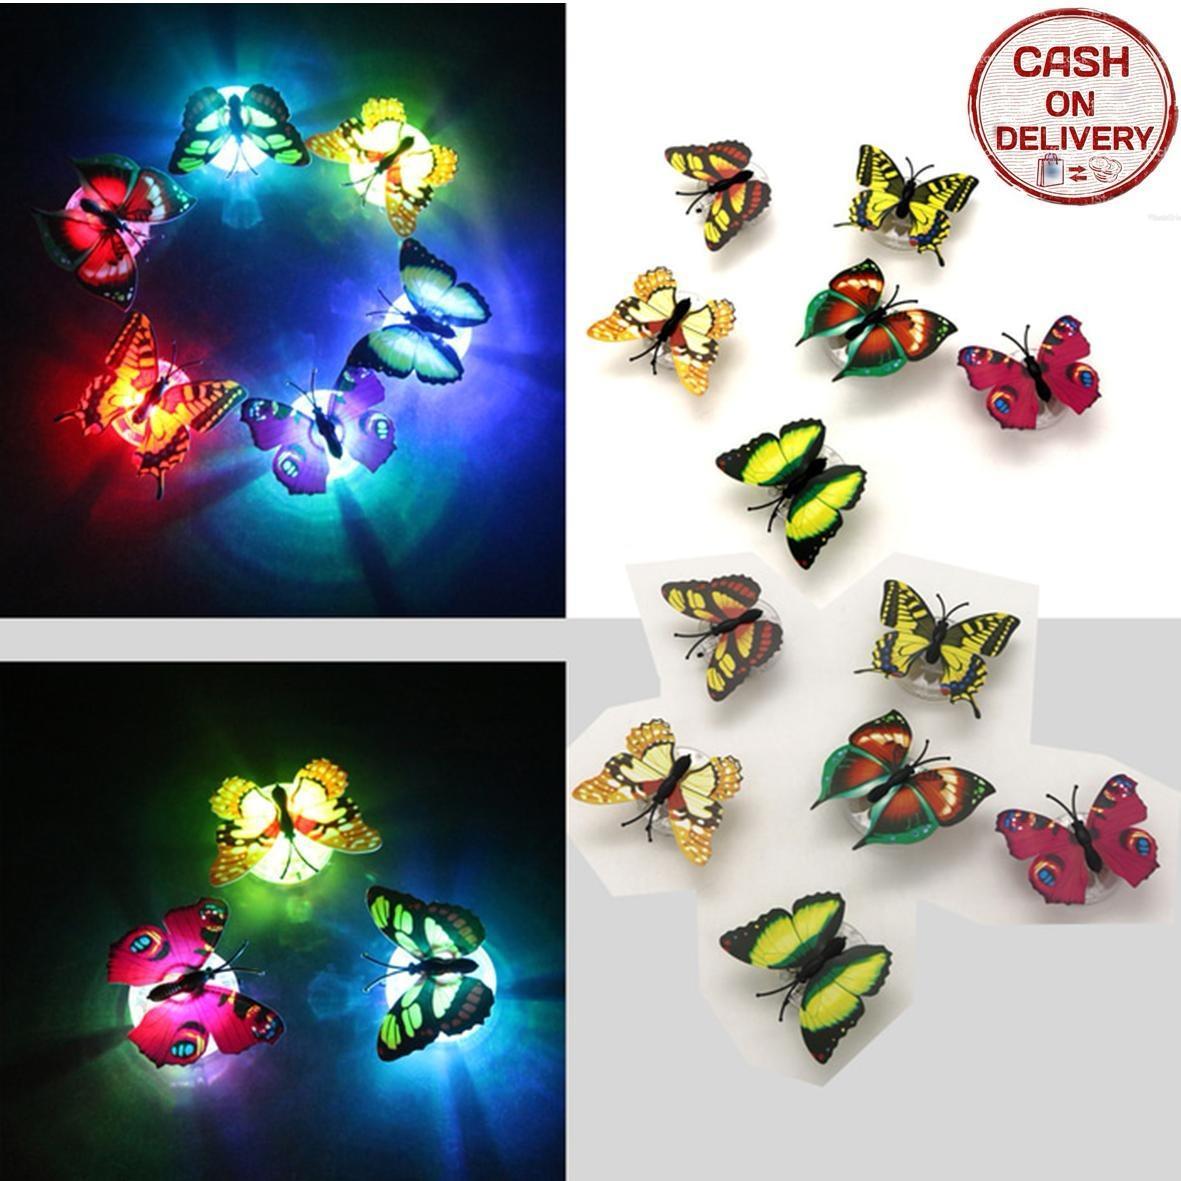 Kado Unik-- Lampu Kupu Led Dekorasi Kamar / Butterfly Night Light / Lampu Kamar Tidur / Lampu Led / Lampu Led Hias Kamar / Lampu Led Glow In The Dark / Lampu Kamar Tidur Murah